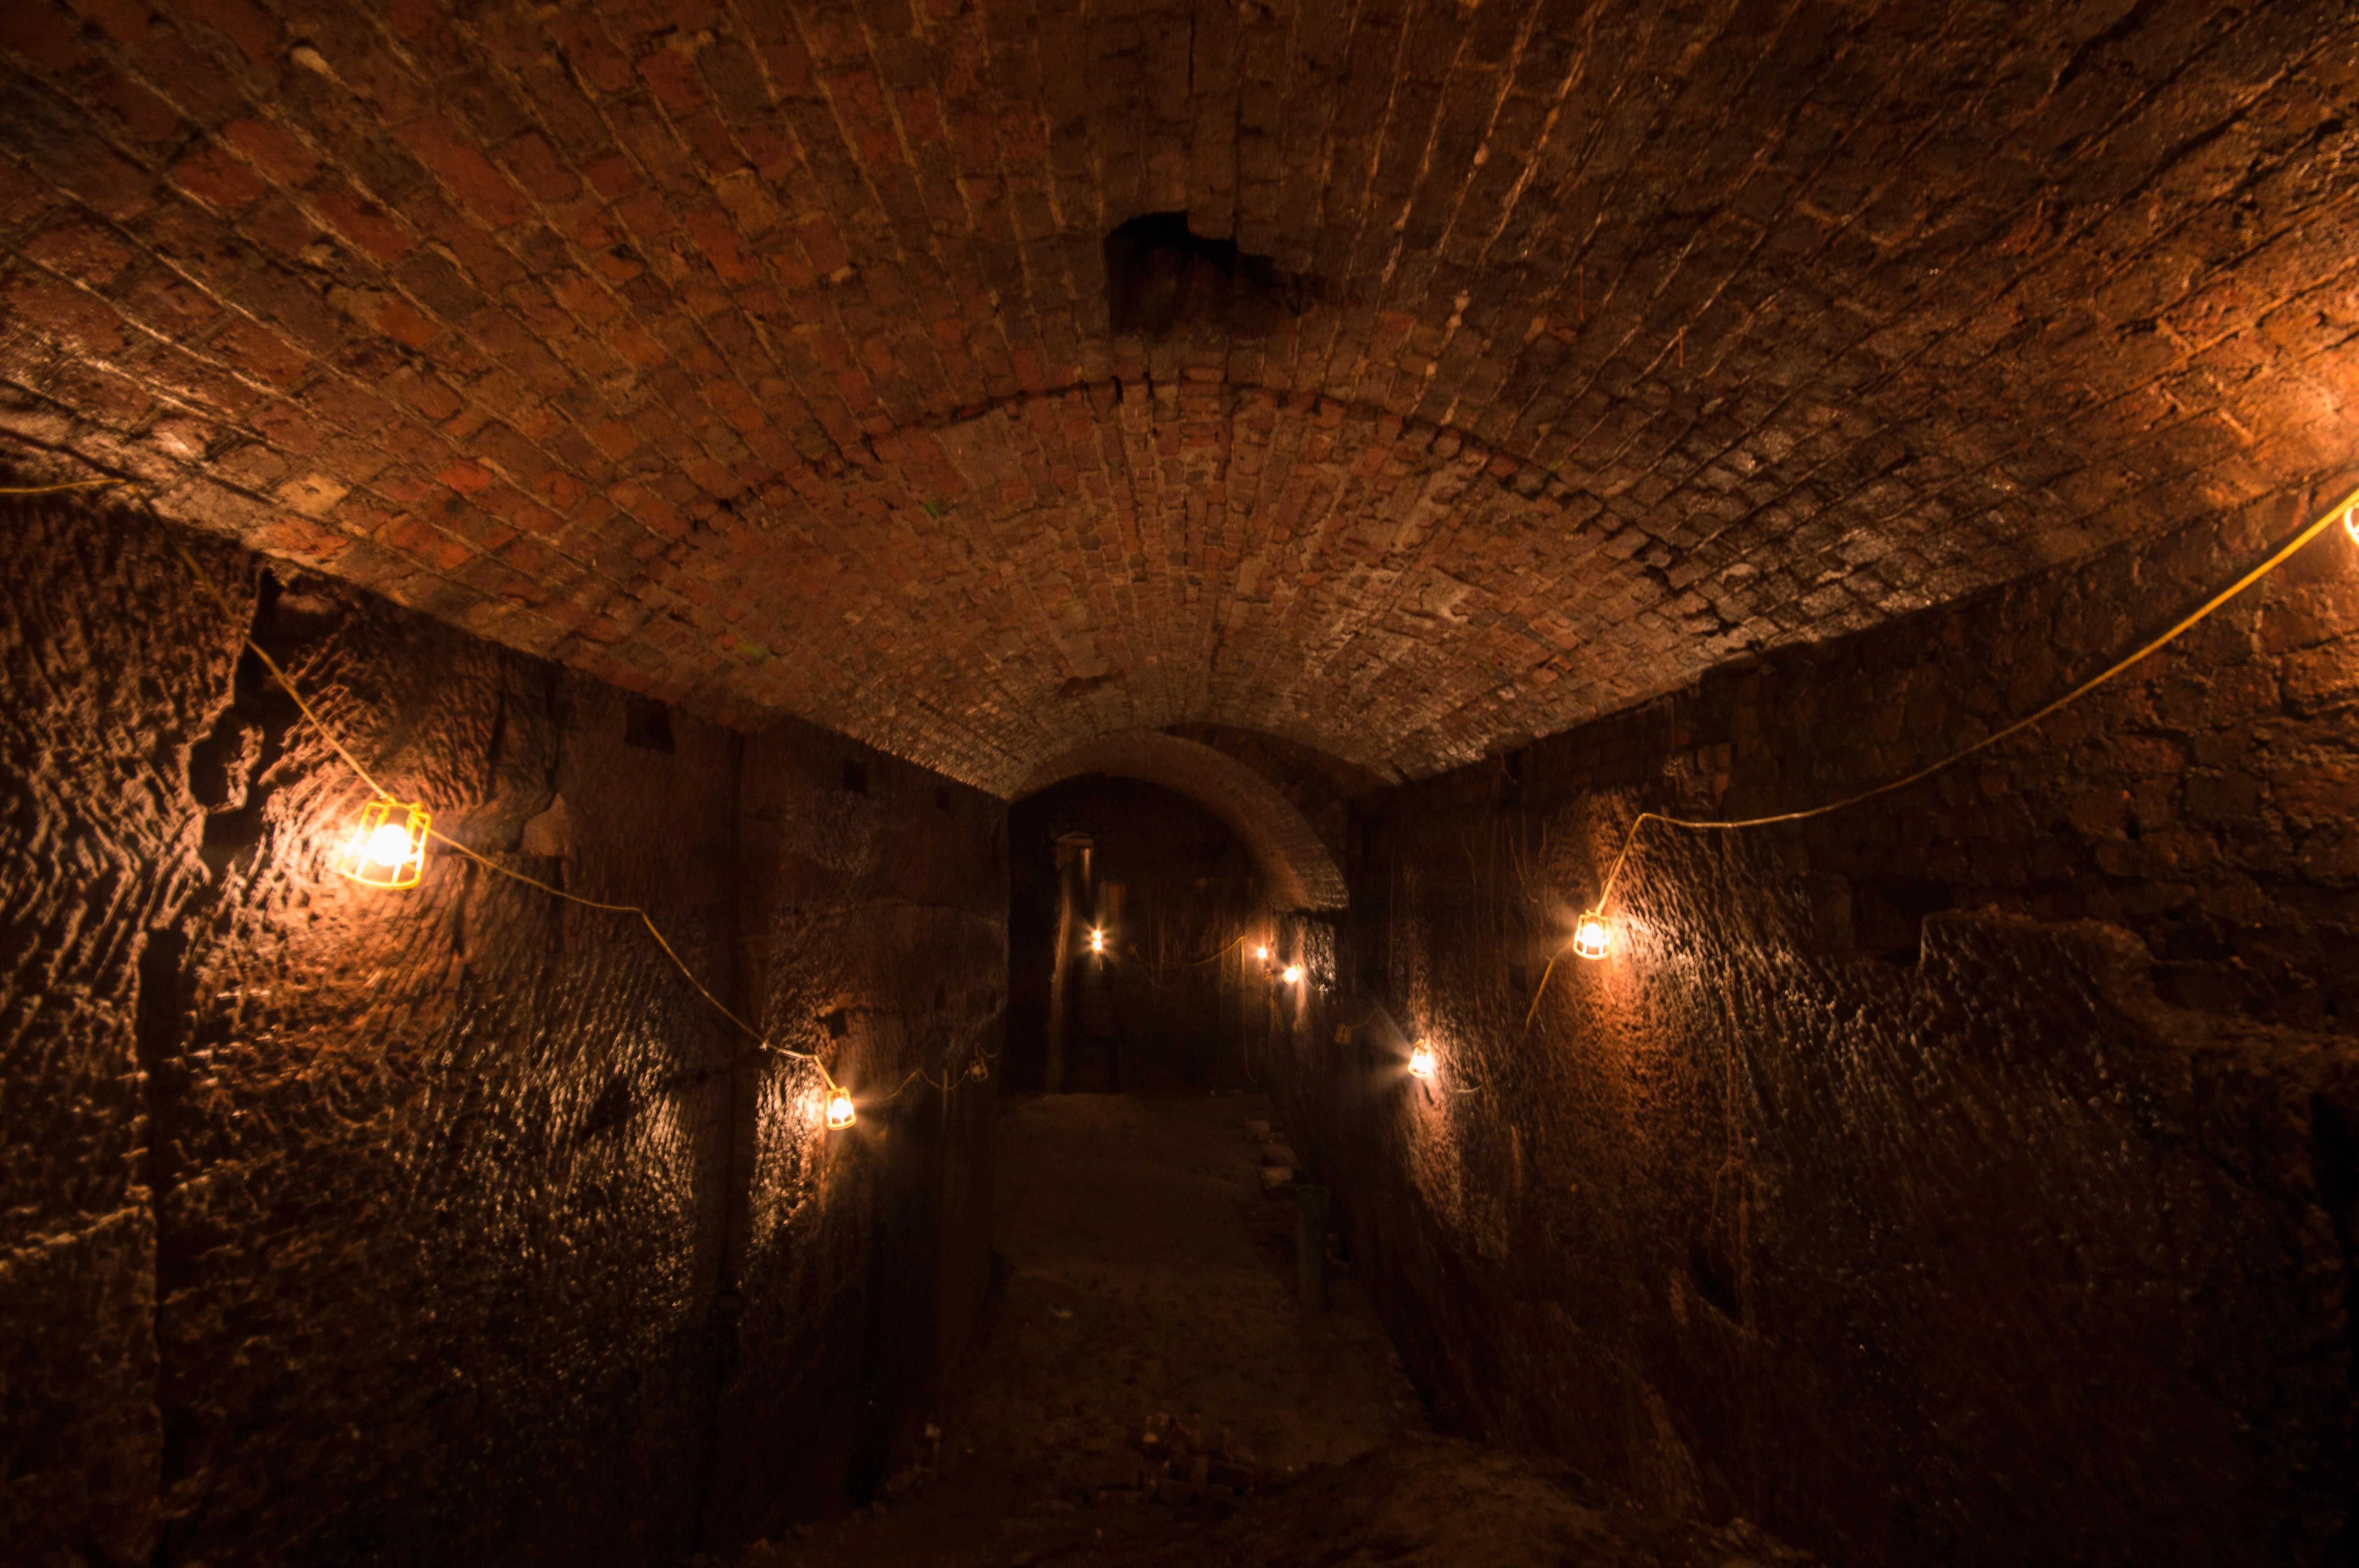 Williamsons' Tunnel